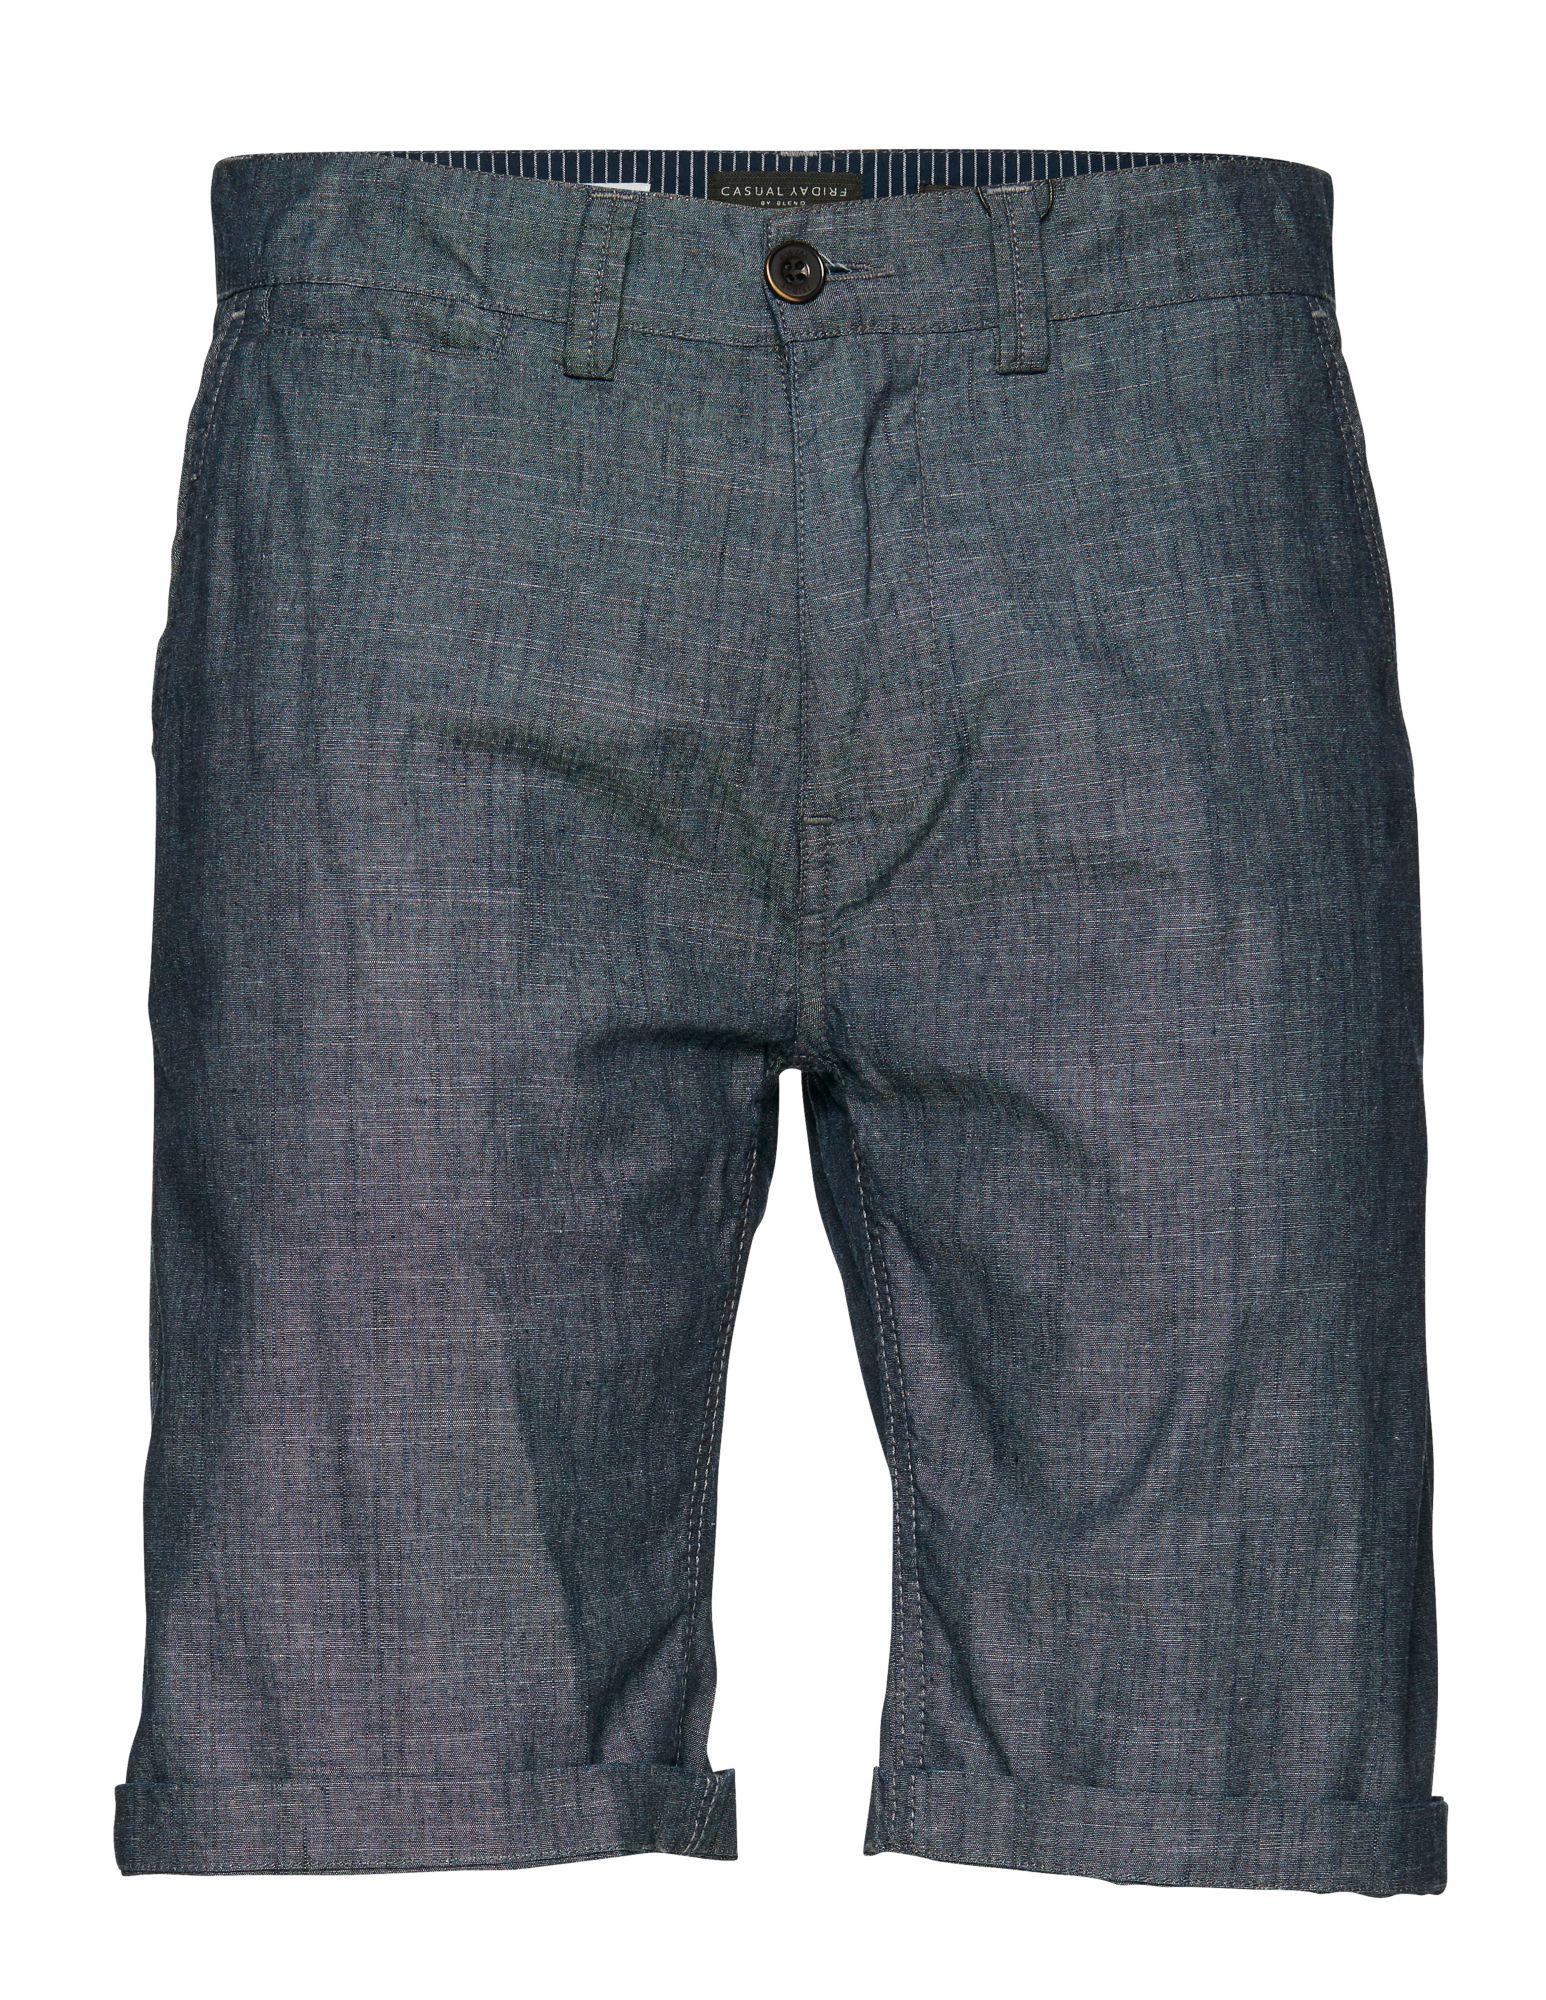 CASUAL FRIDAY Casual Shorts